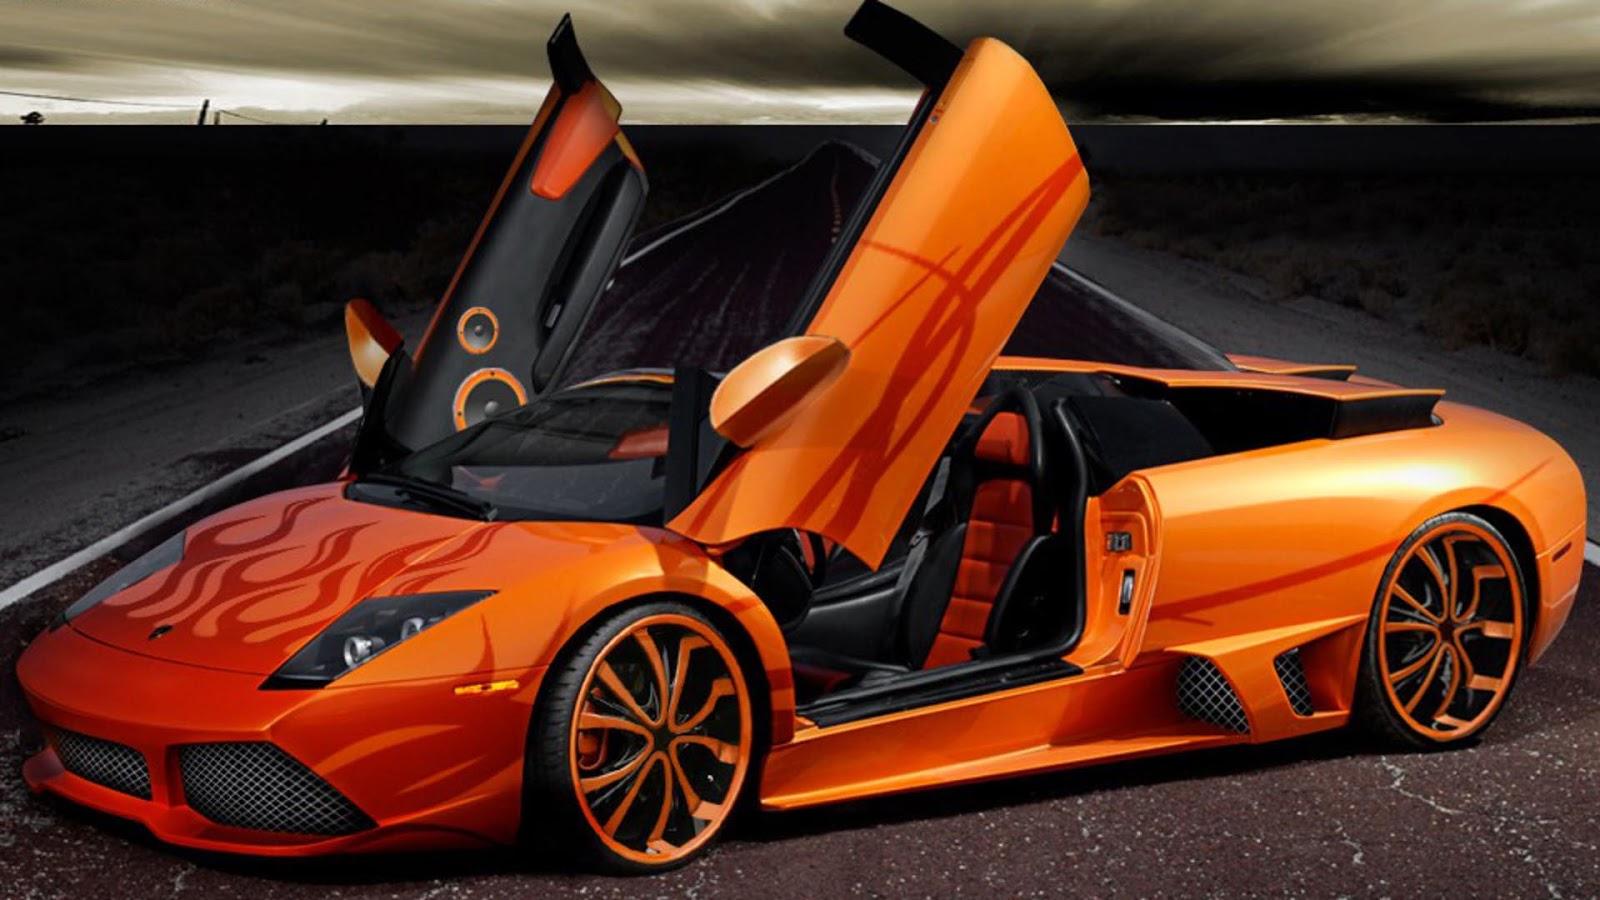 Lamborghini Car Stylish HD Image